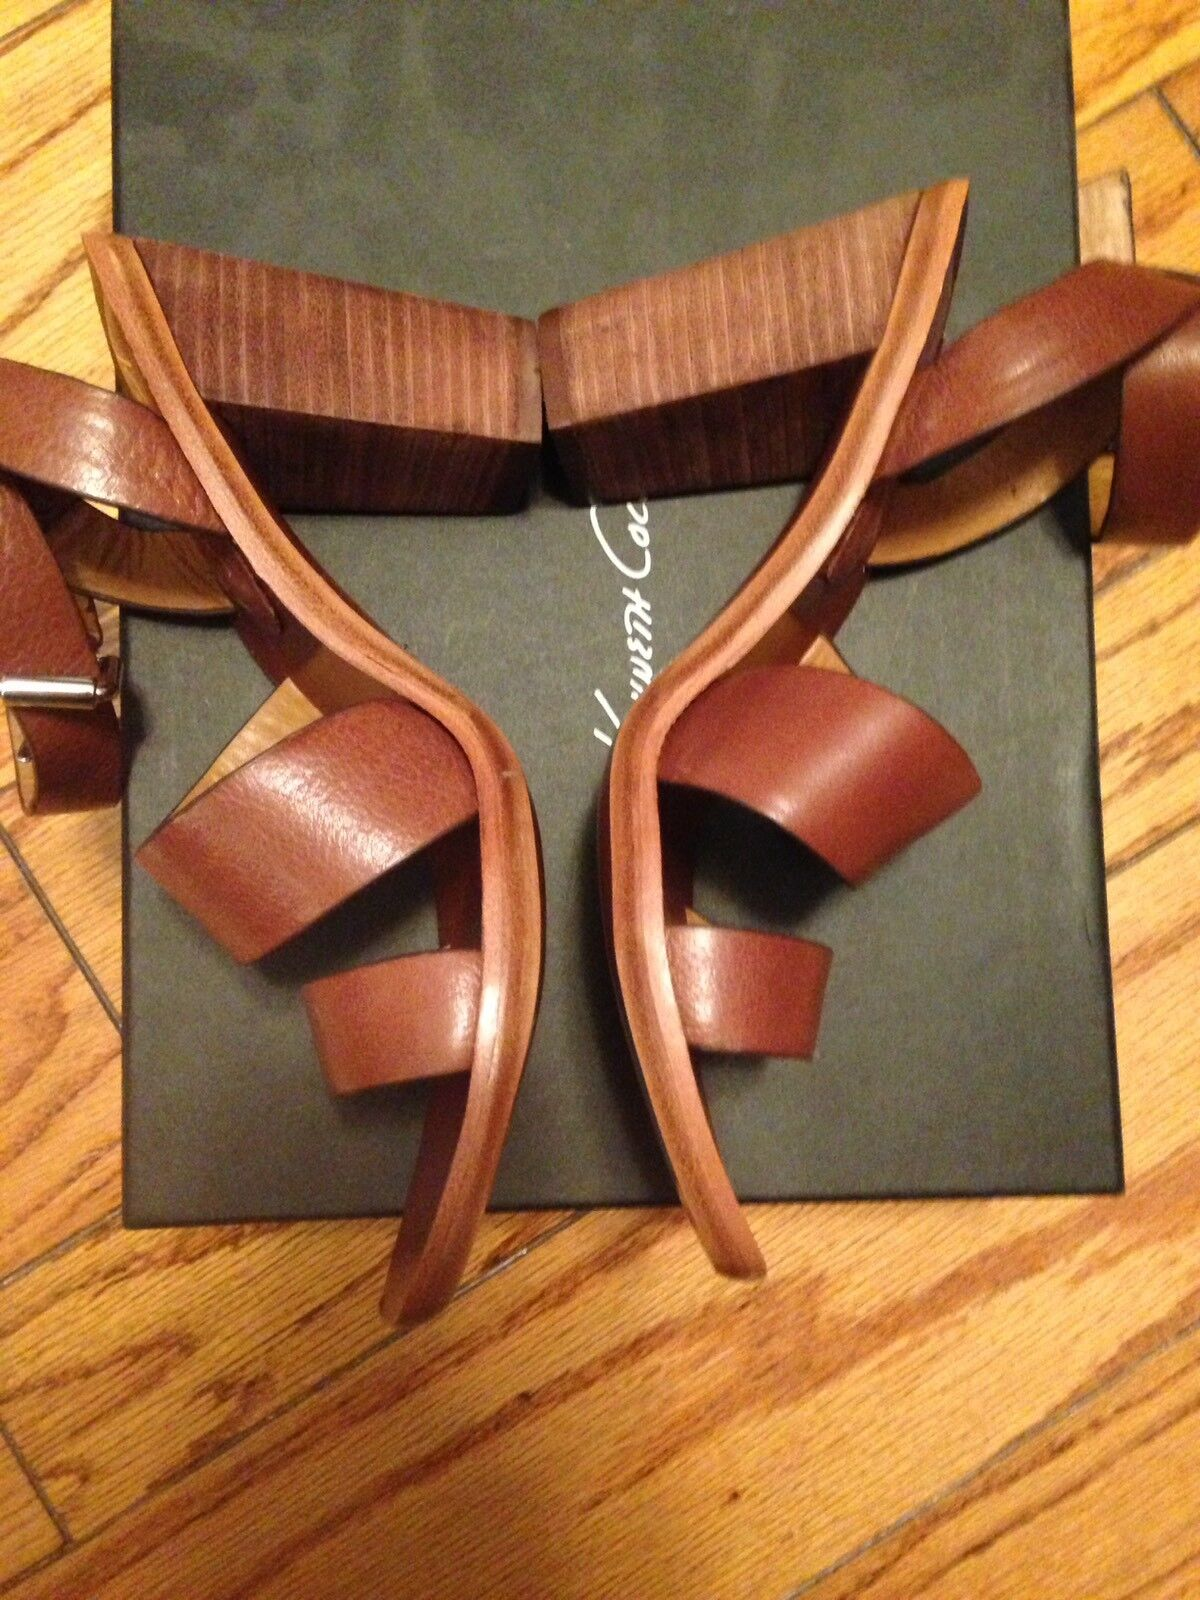 NEW 7 Kenneth Cole New York 7 NEW 7.5 8 Niedrig Heels Cognac Sandales Schuhes All Leder FAB d814cb